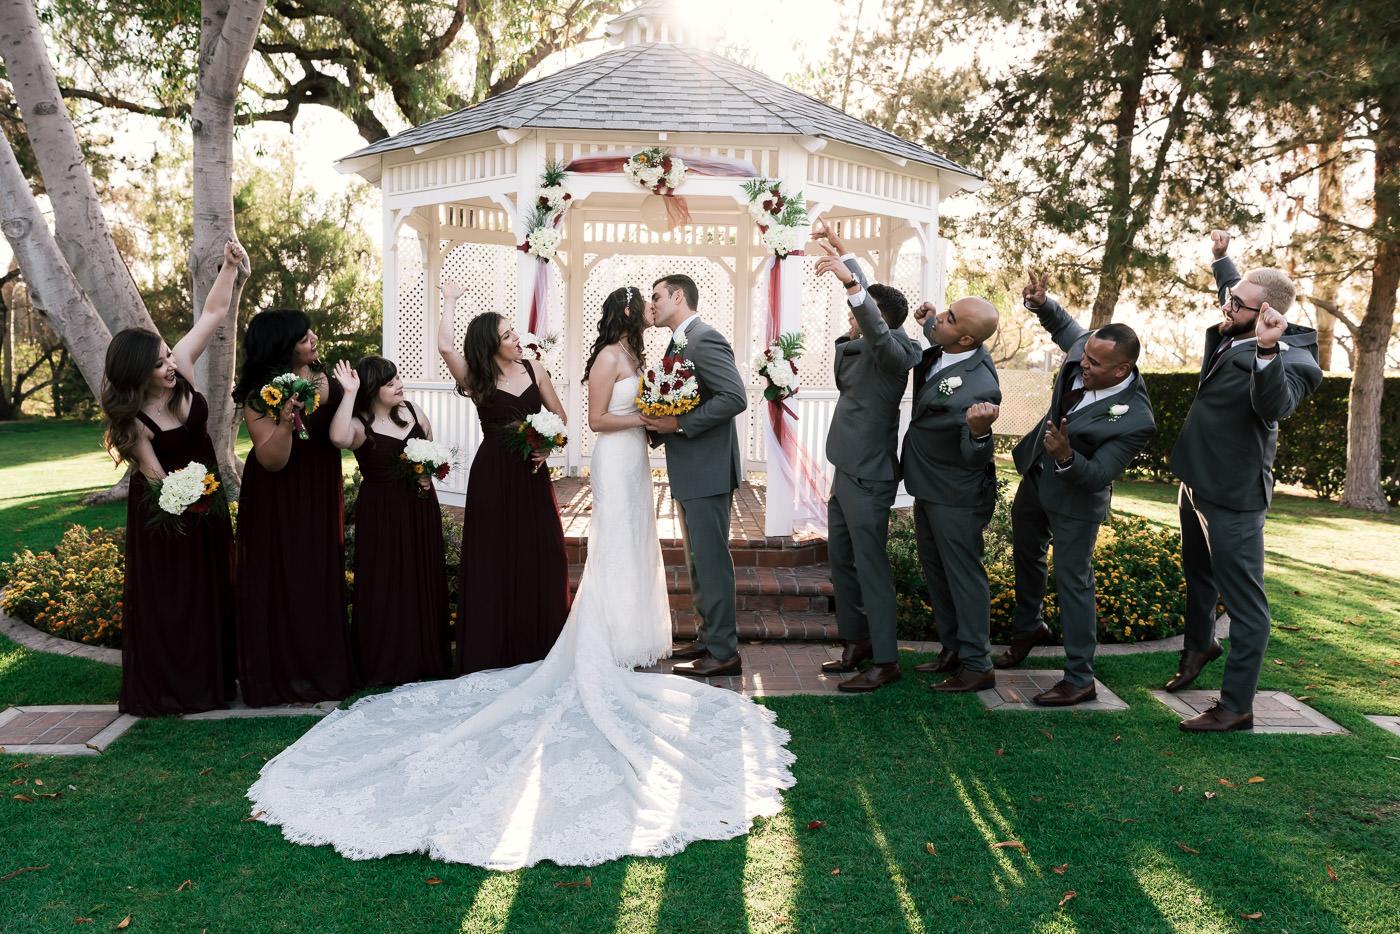 Best wedding photographer near Placentia California.